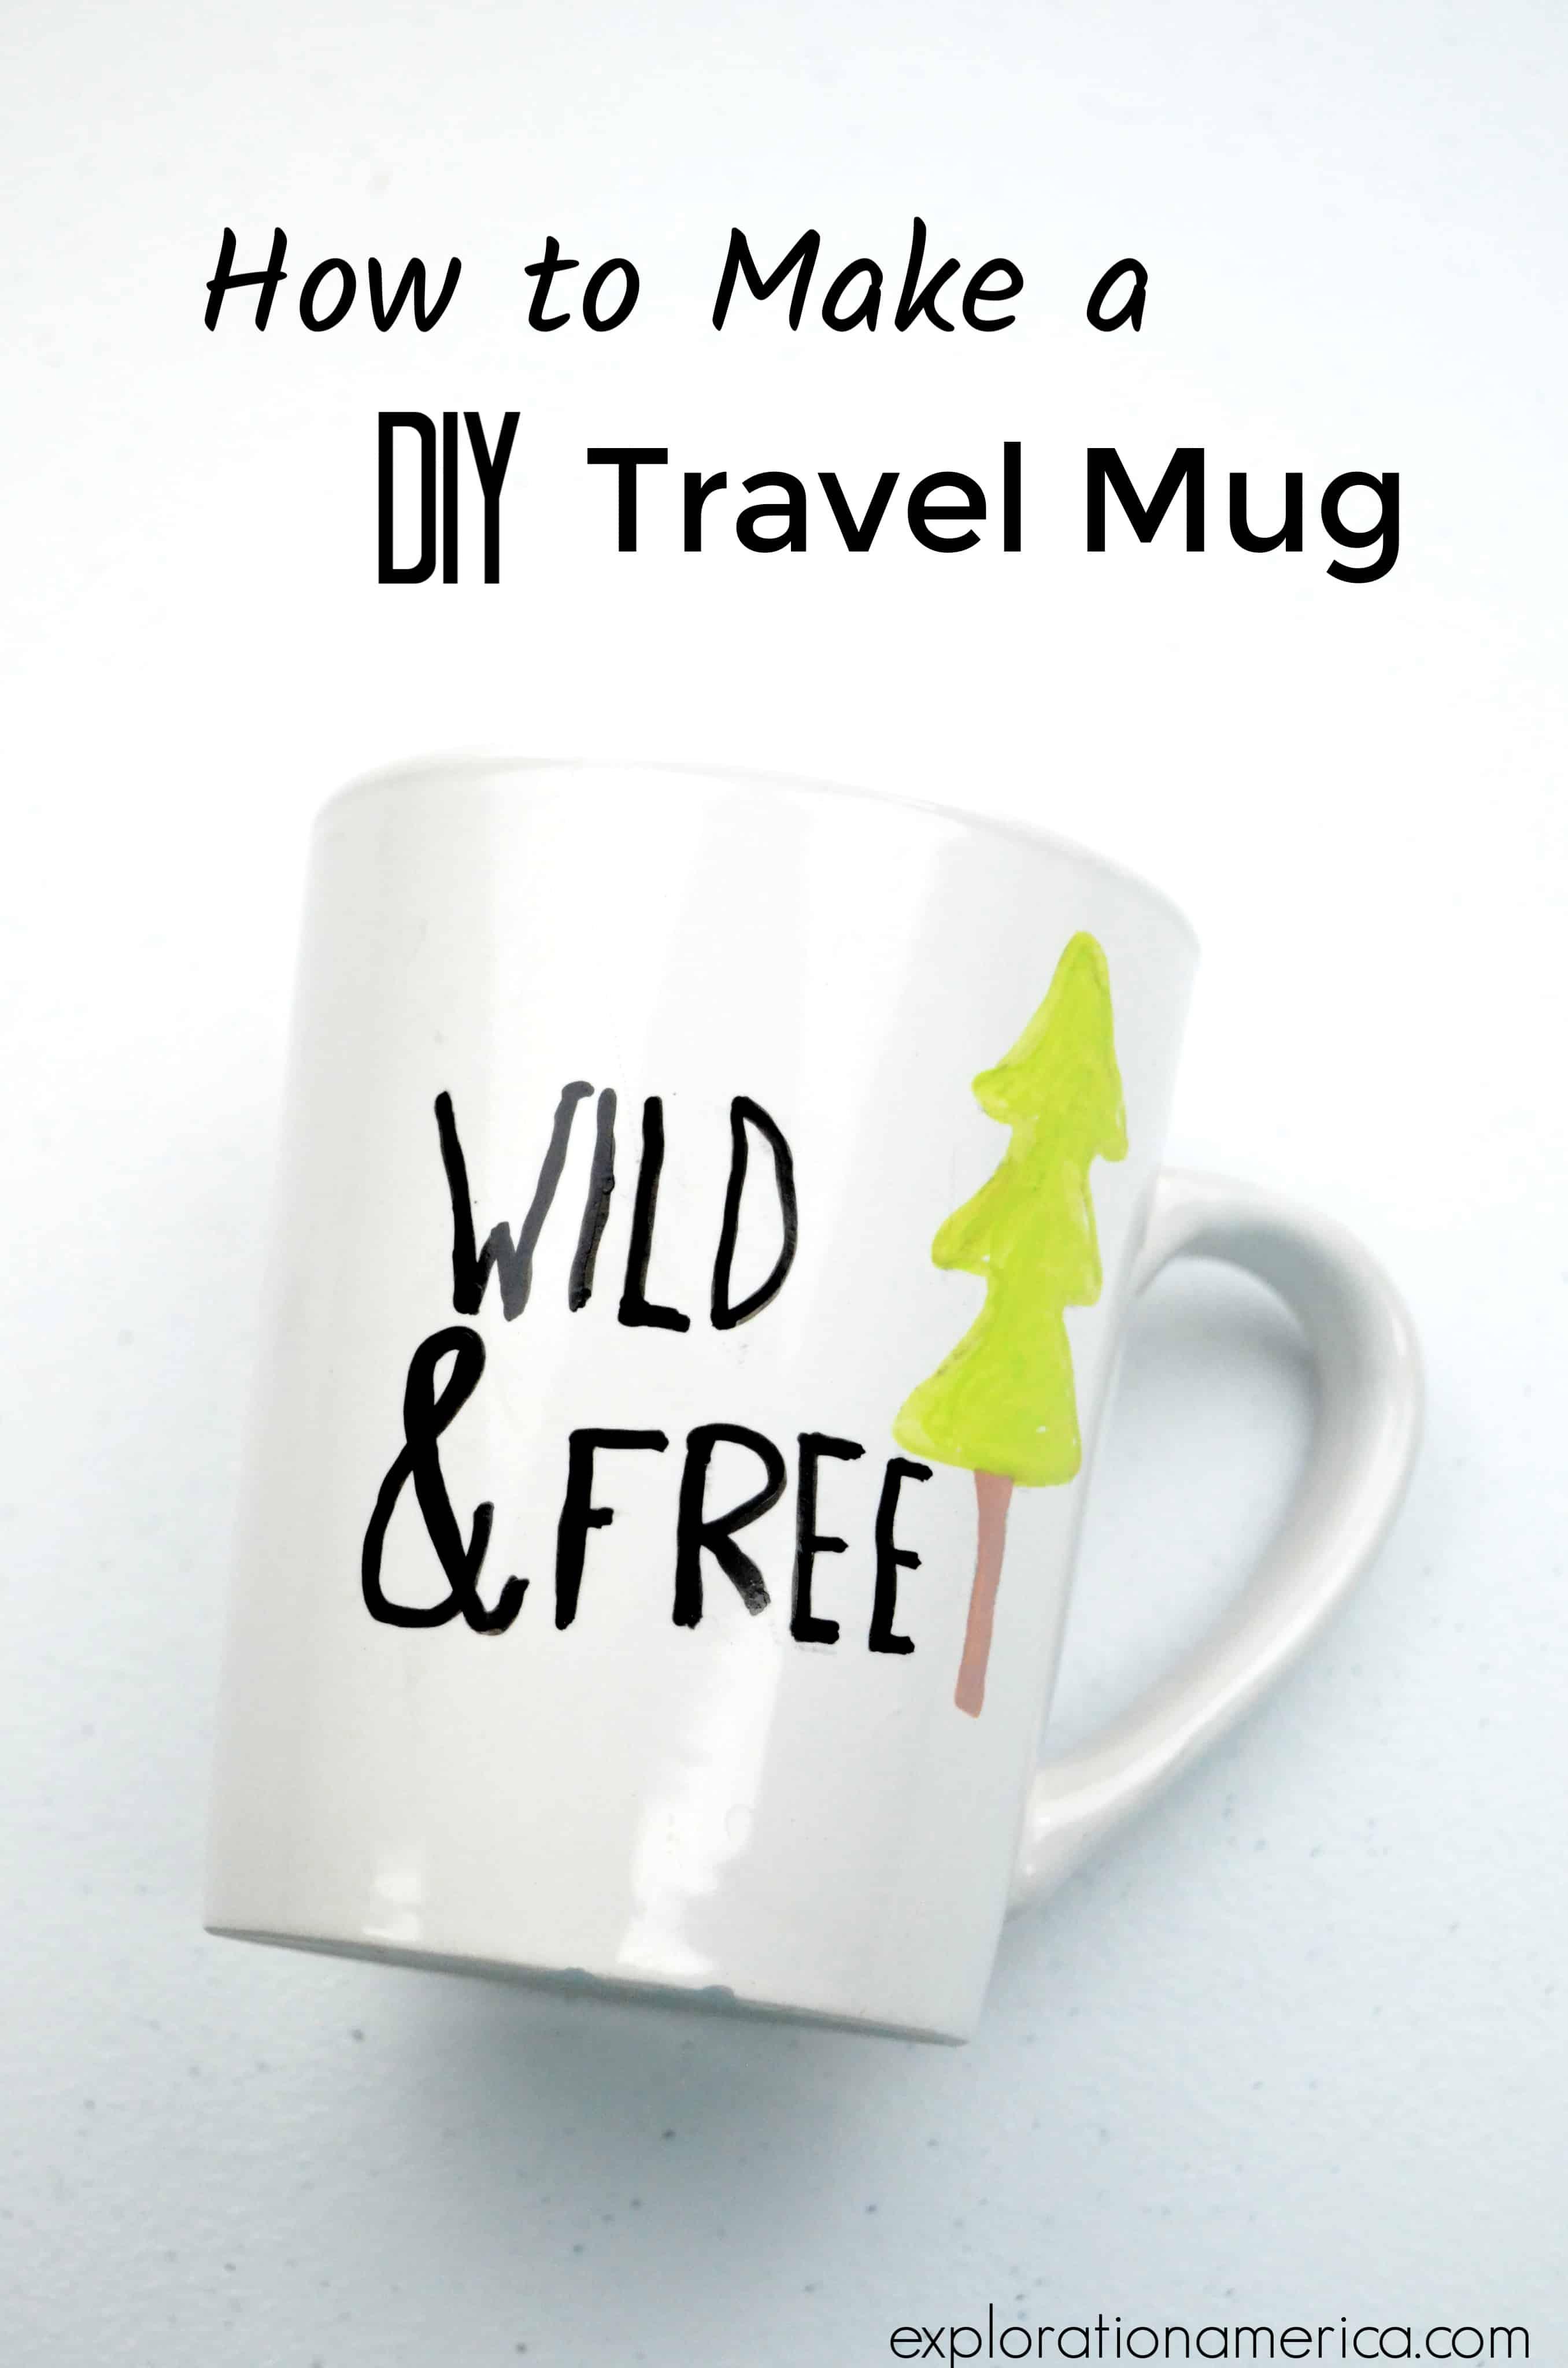 Wild & Free travel mug paint